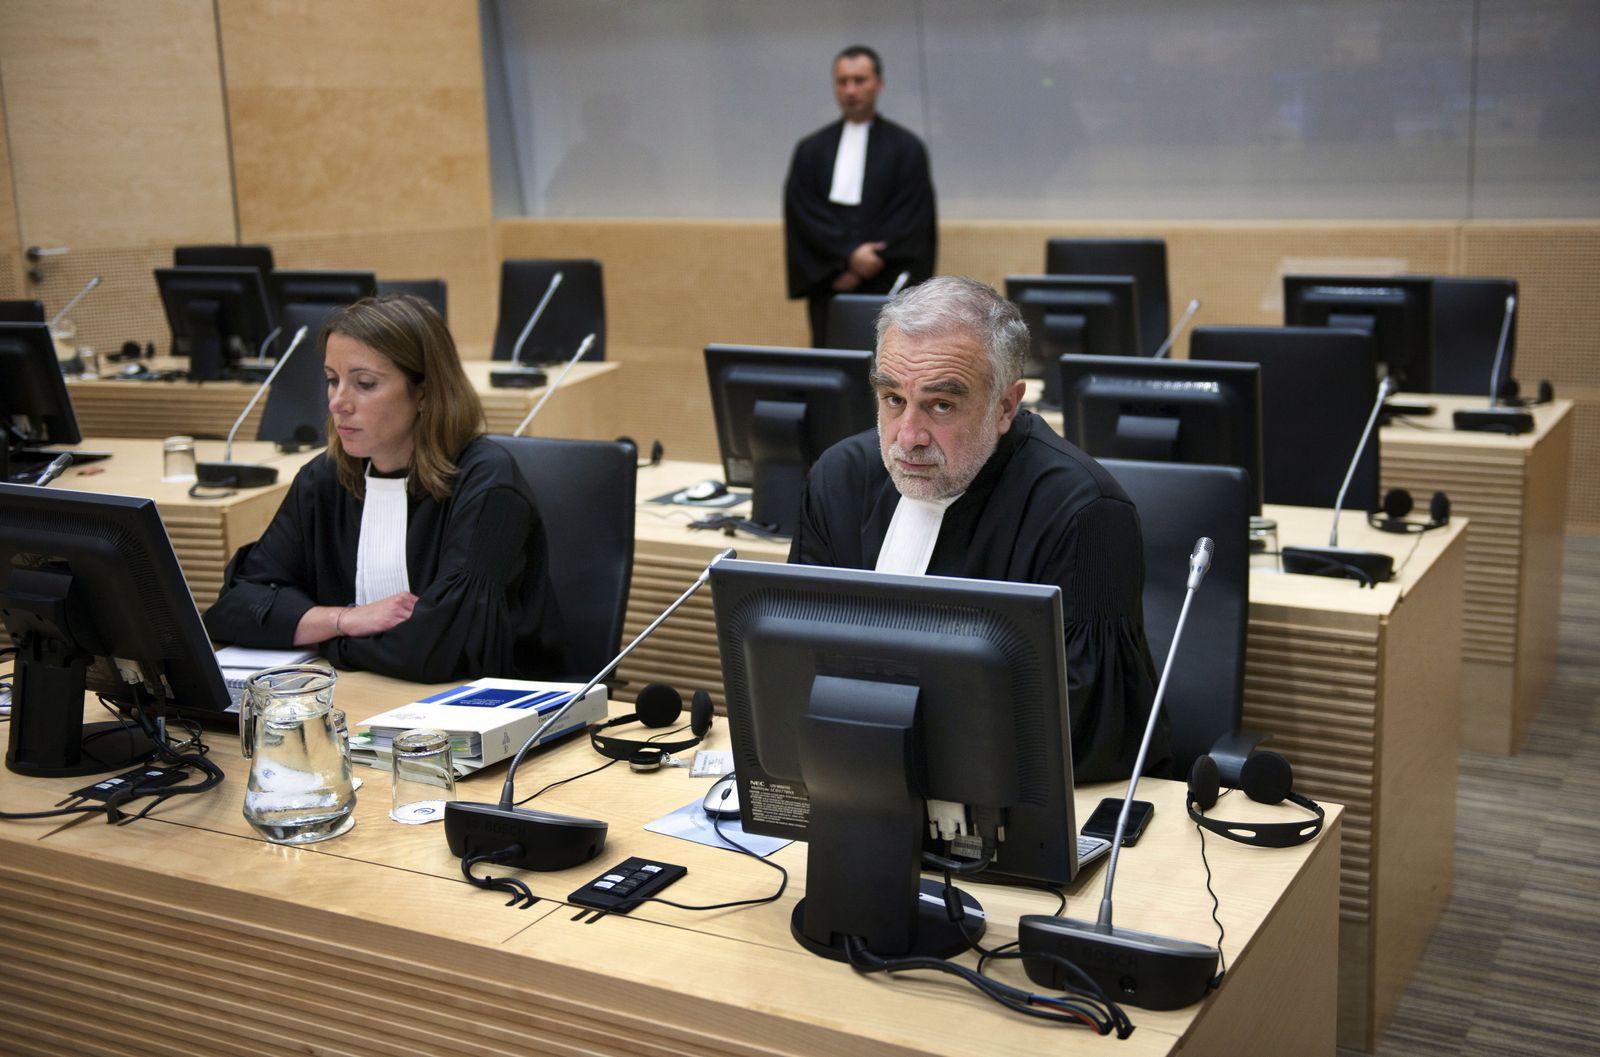 Luis Moreno Ocampo ICC issues arrest warrant for Muammar Gaddafi